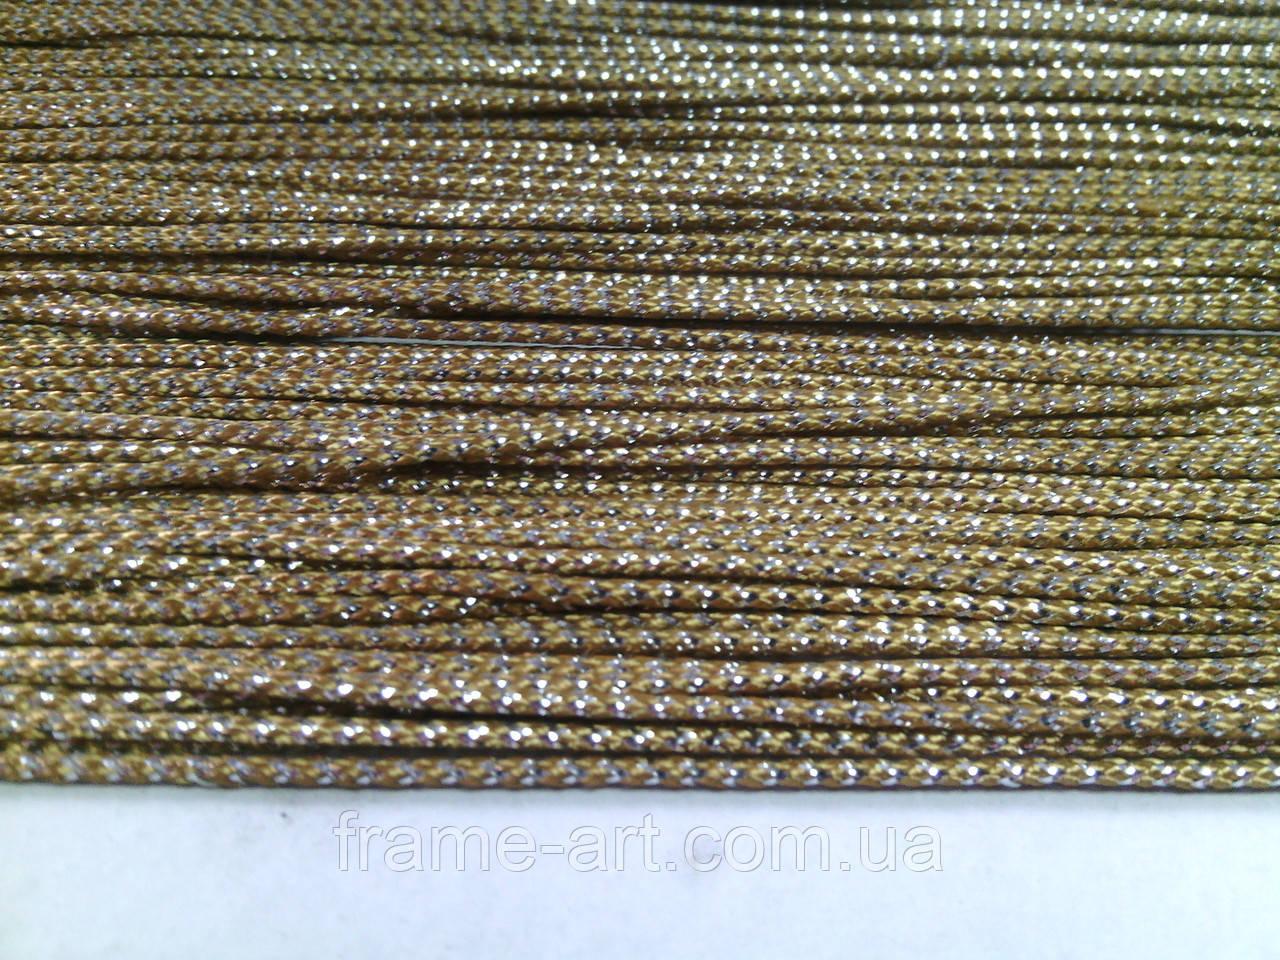 Шнур люрекс 2мм Цвет10 silver 964/50